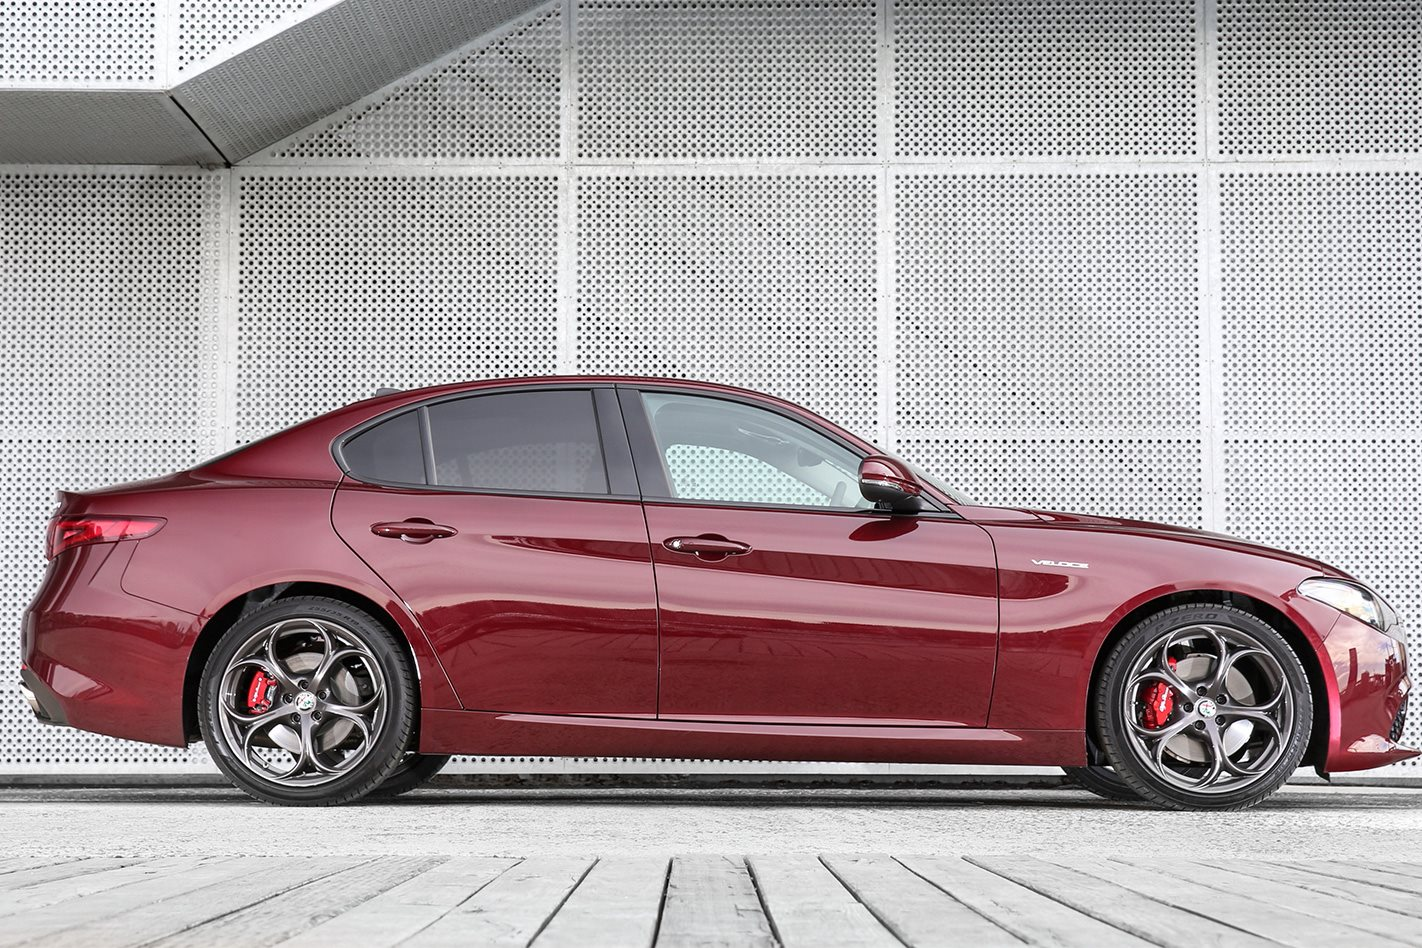 2017 Alfa Romeo Giulia Veloce side profile